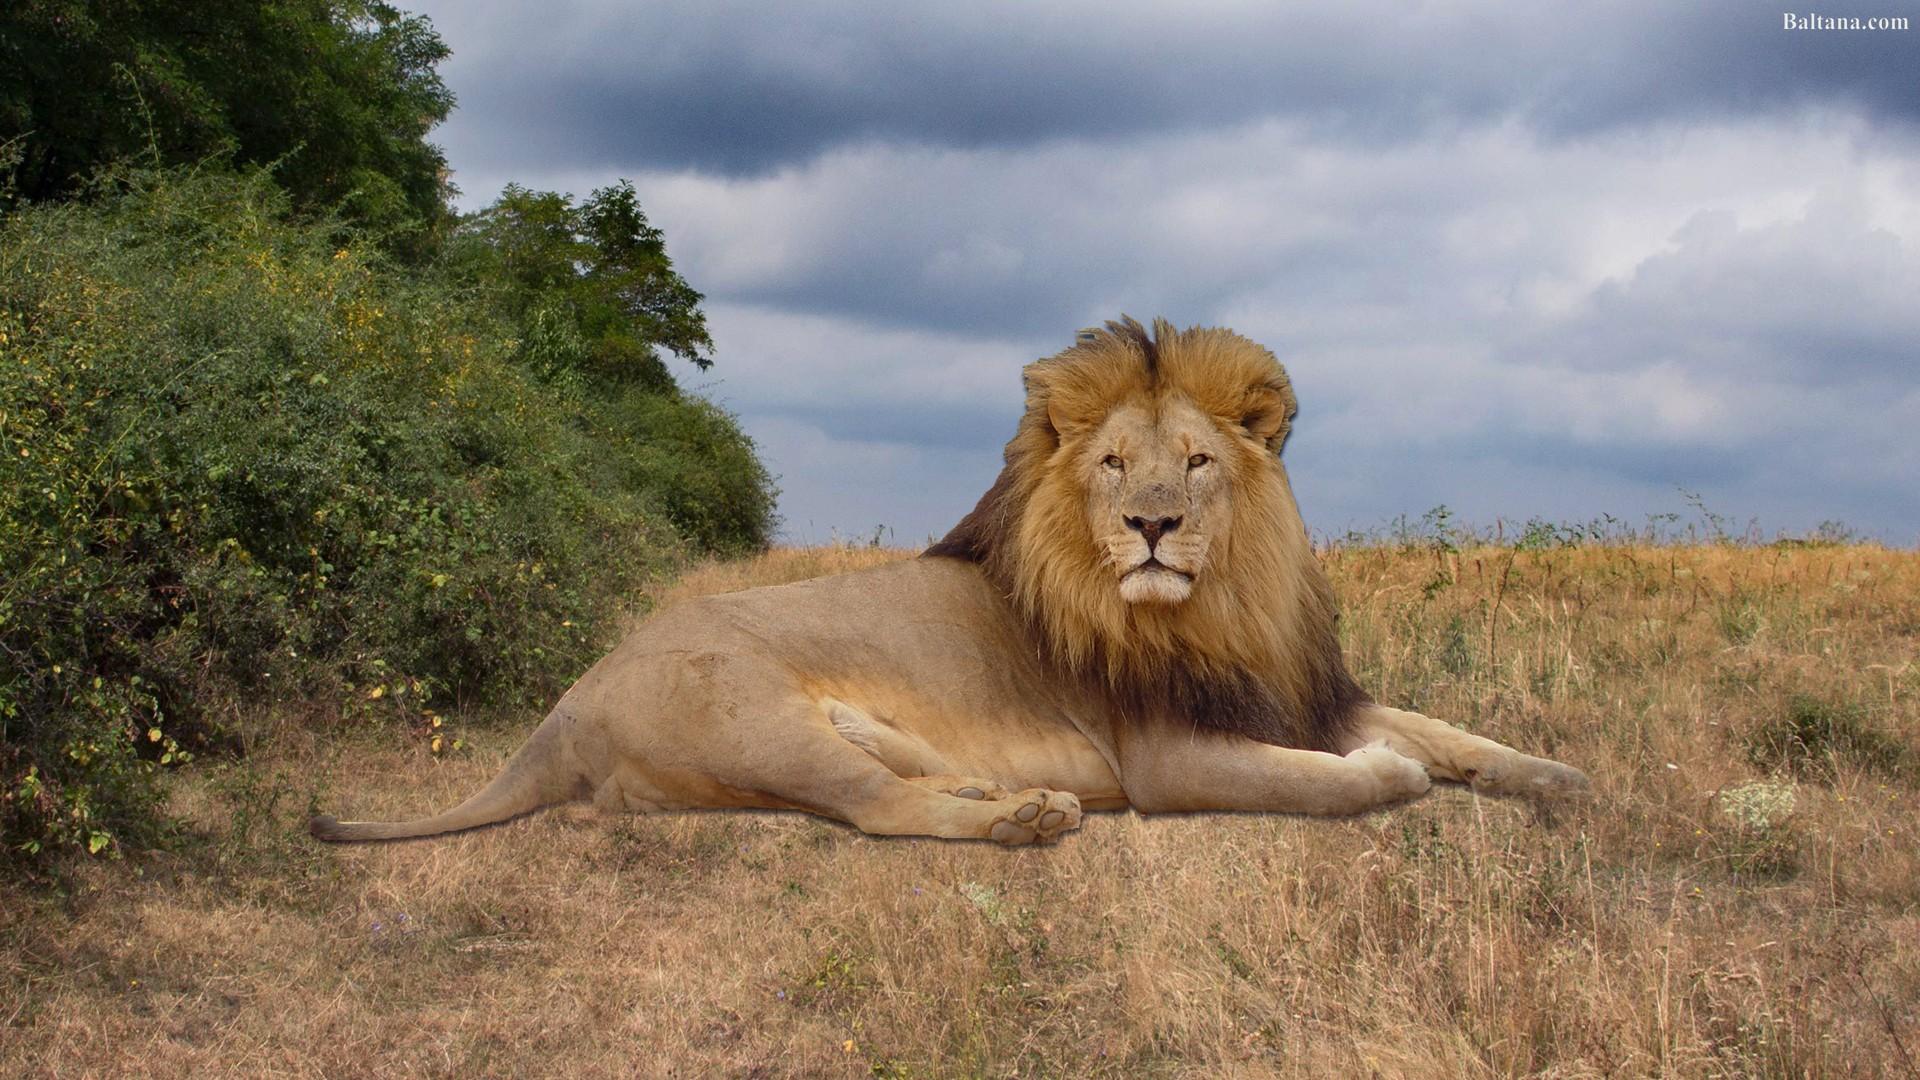 Lion Hd Desktop Wallpaper - Lion Hd Images For Desktop , HD Wallpaper & Backgrounds